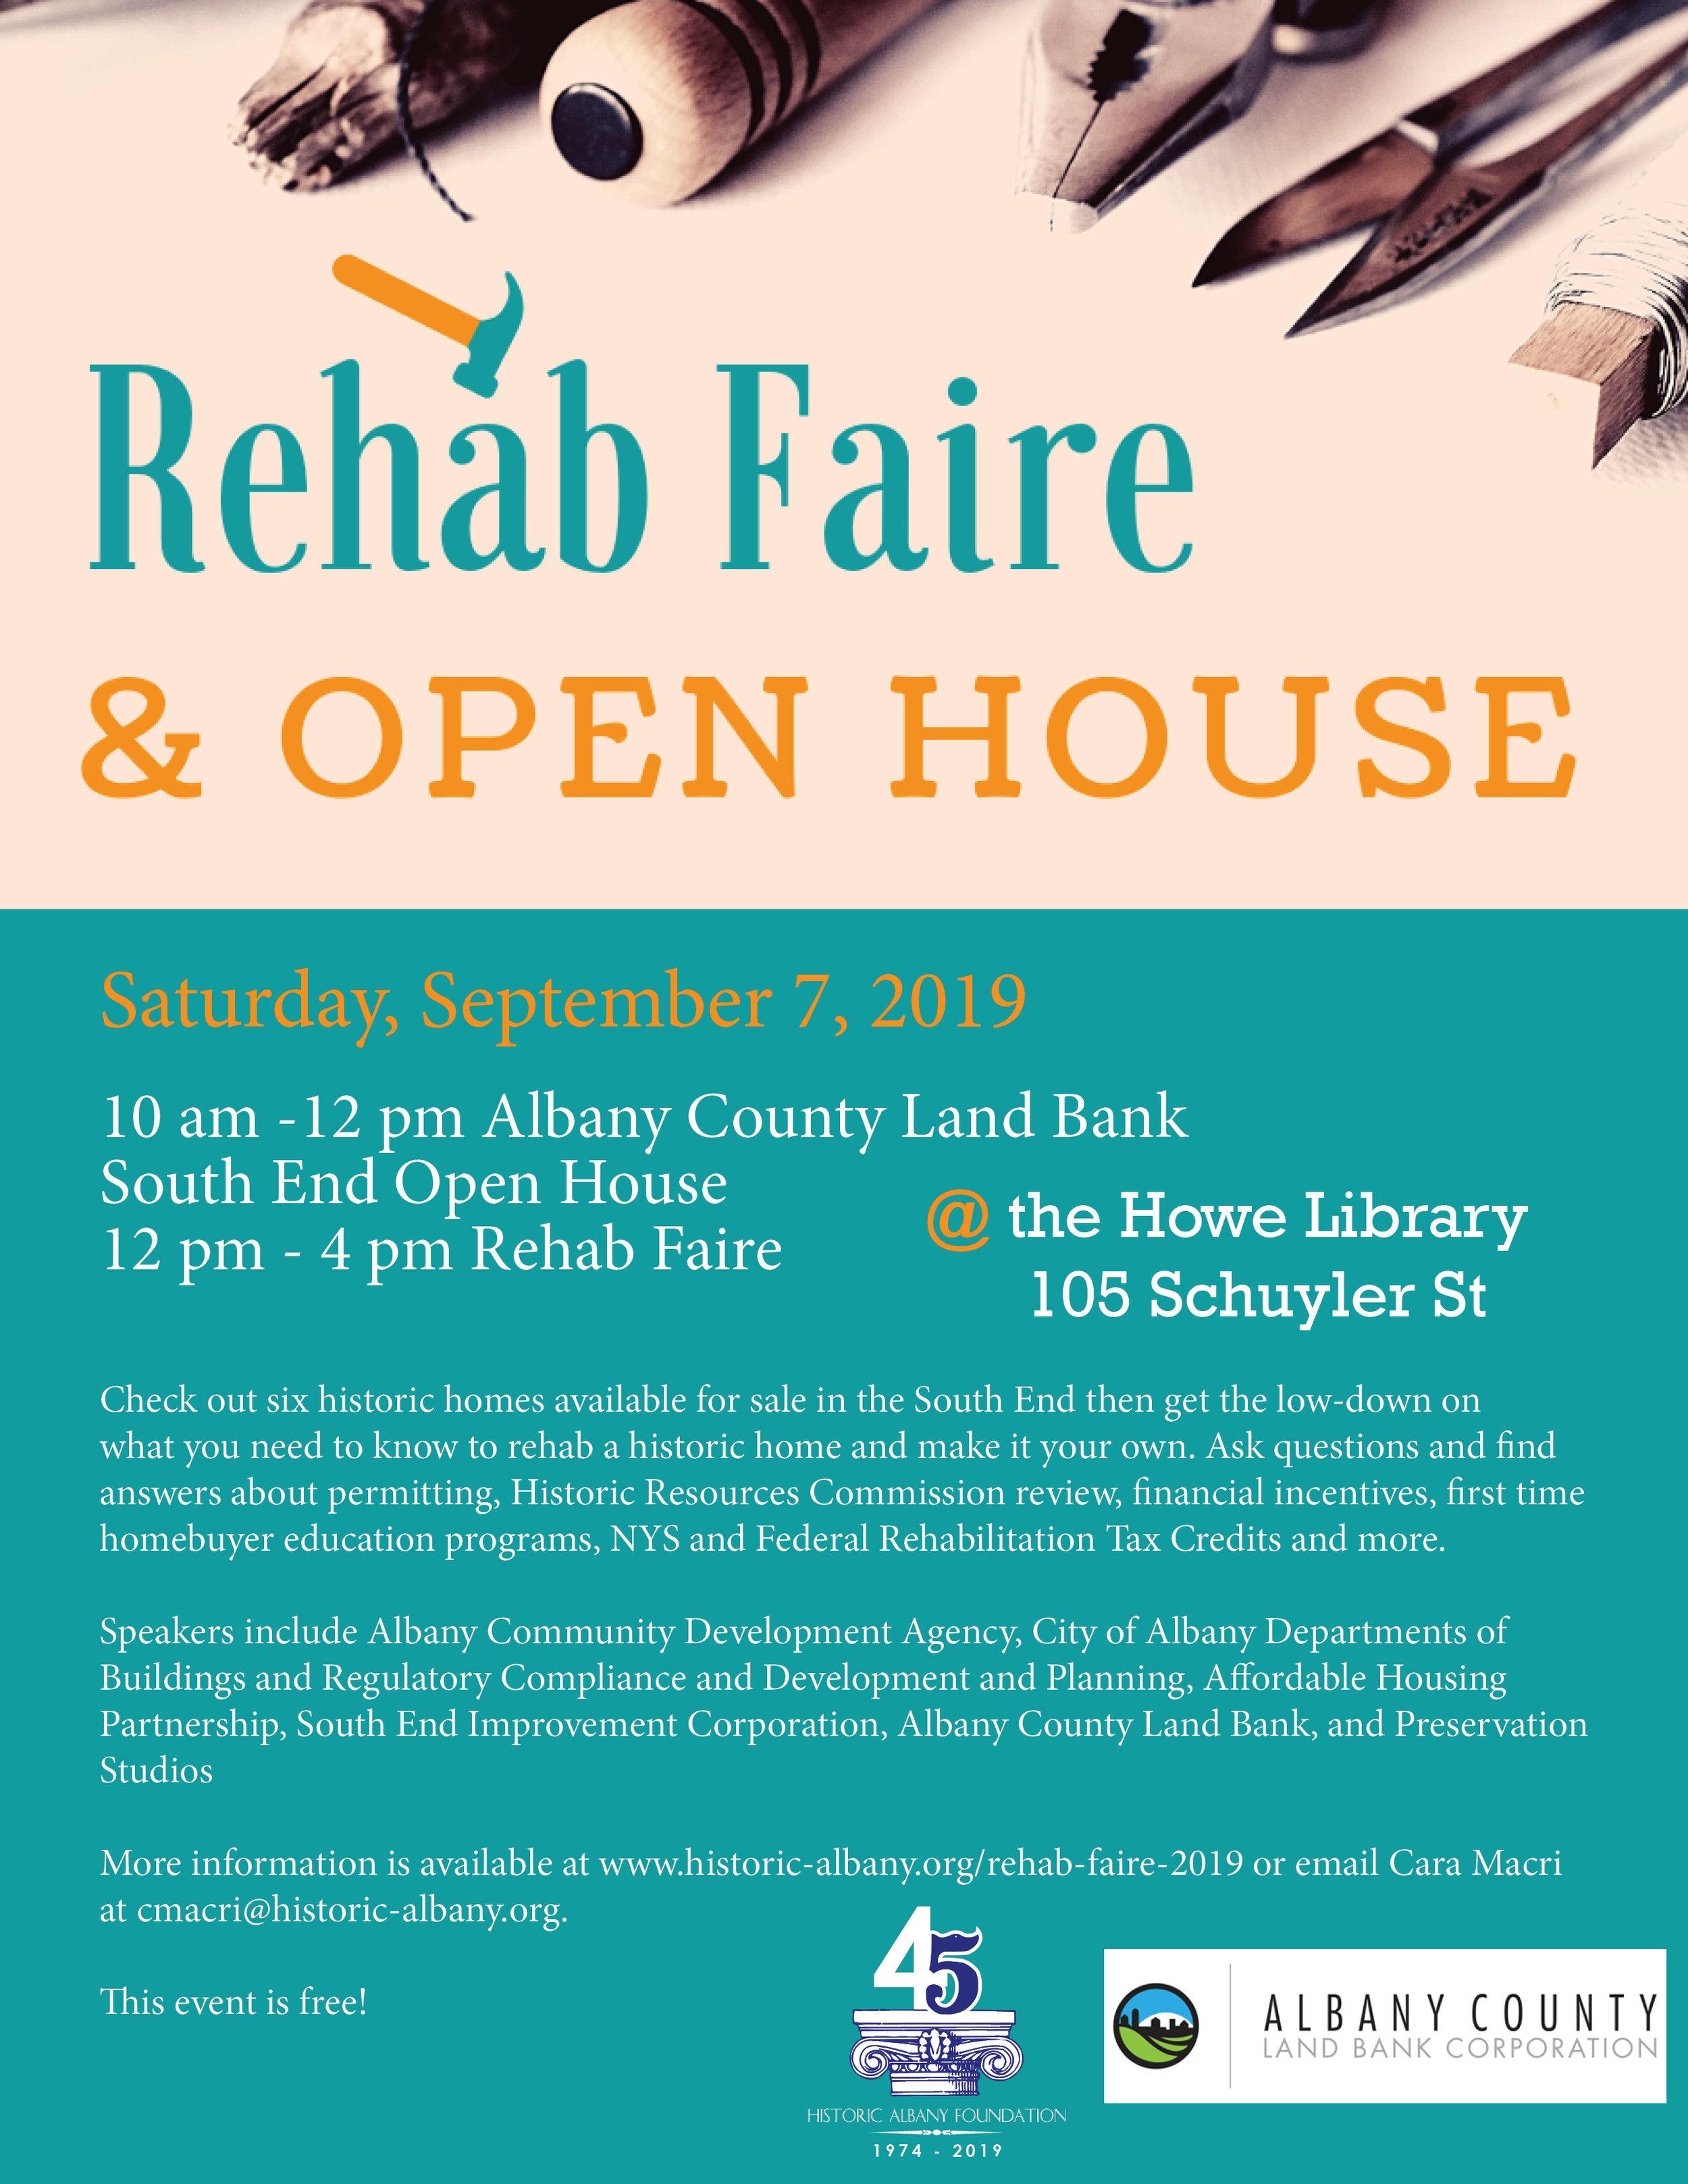 RehabFaire Poster.jpg